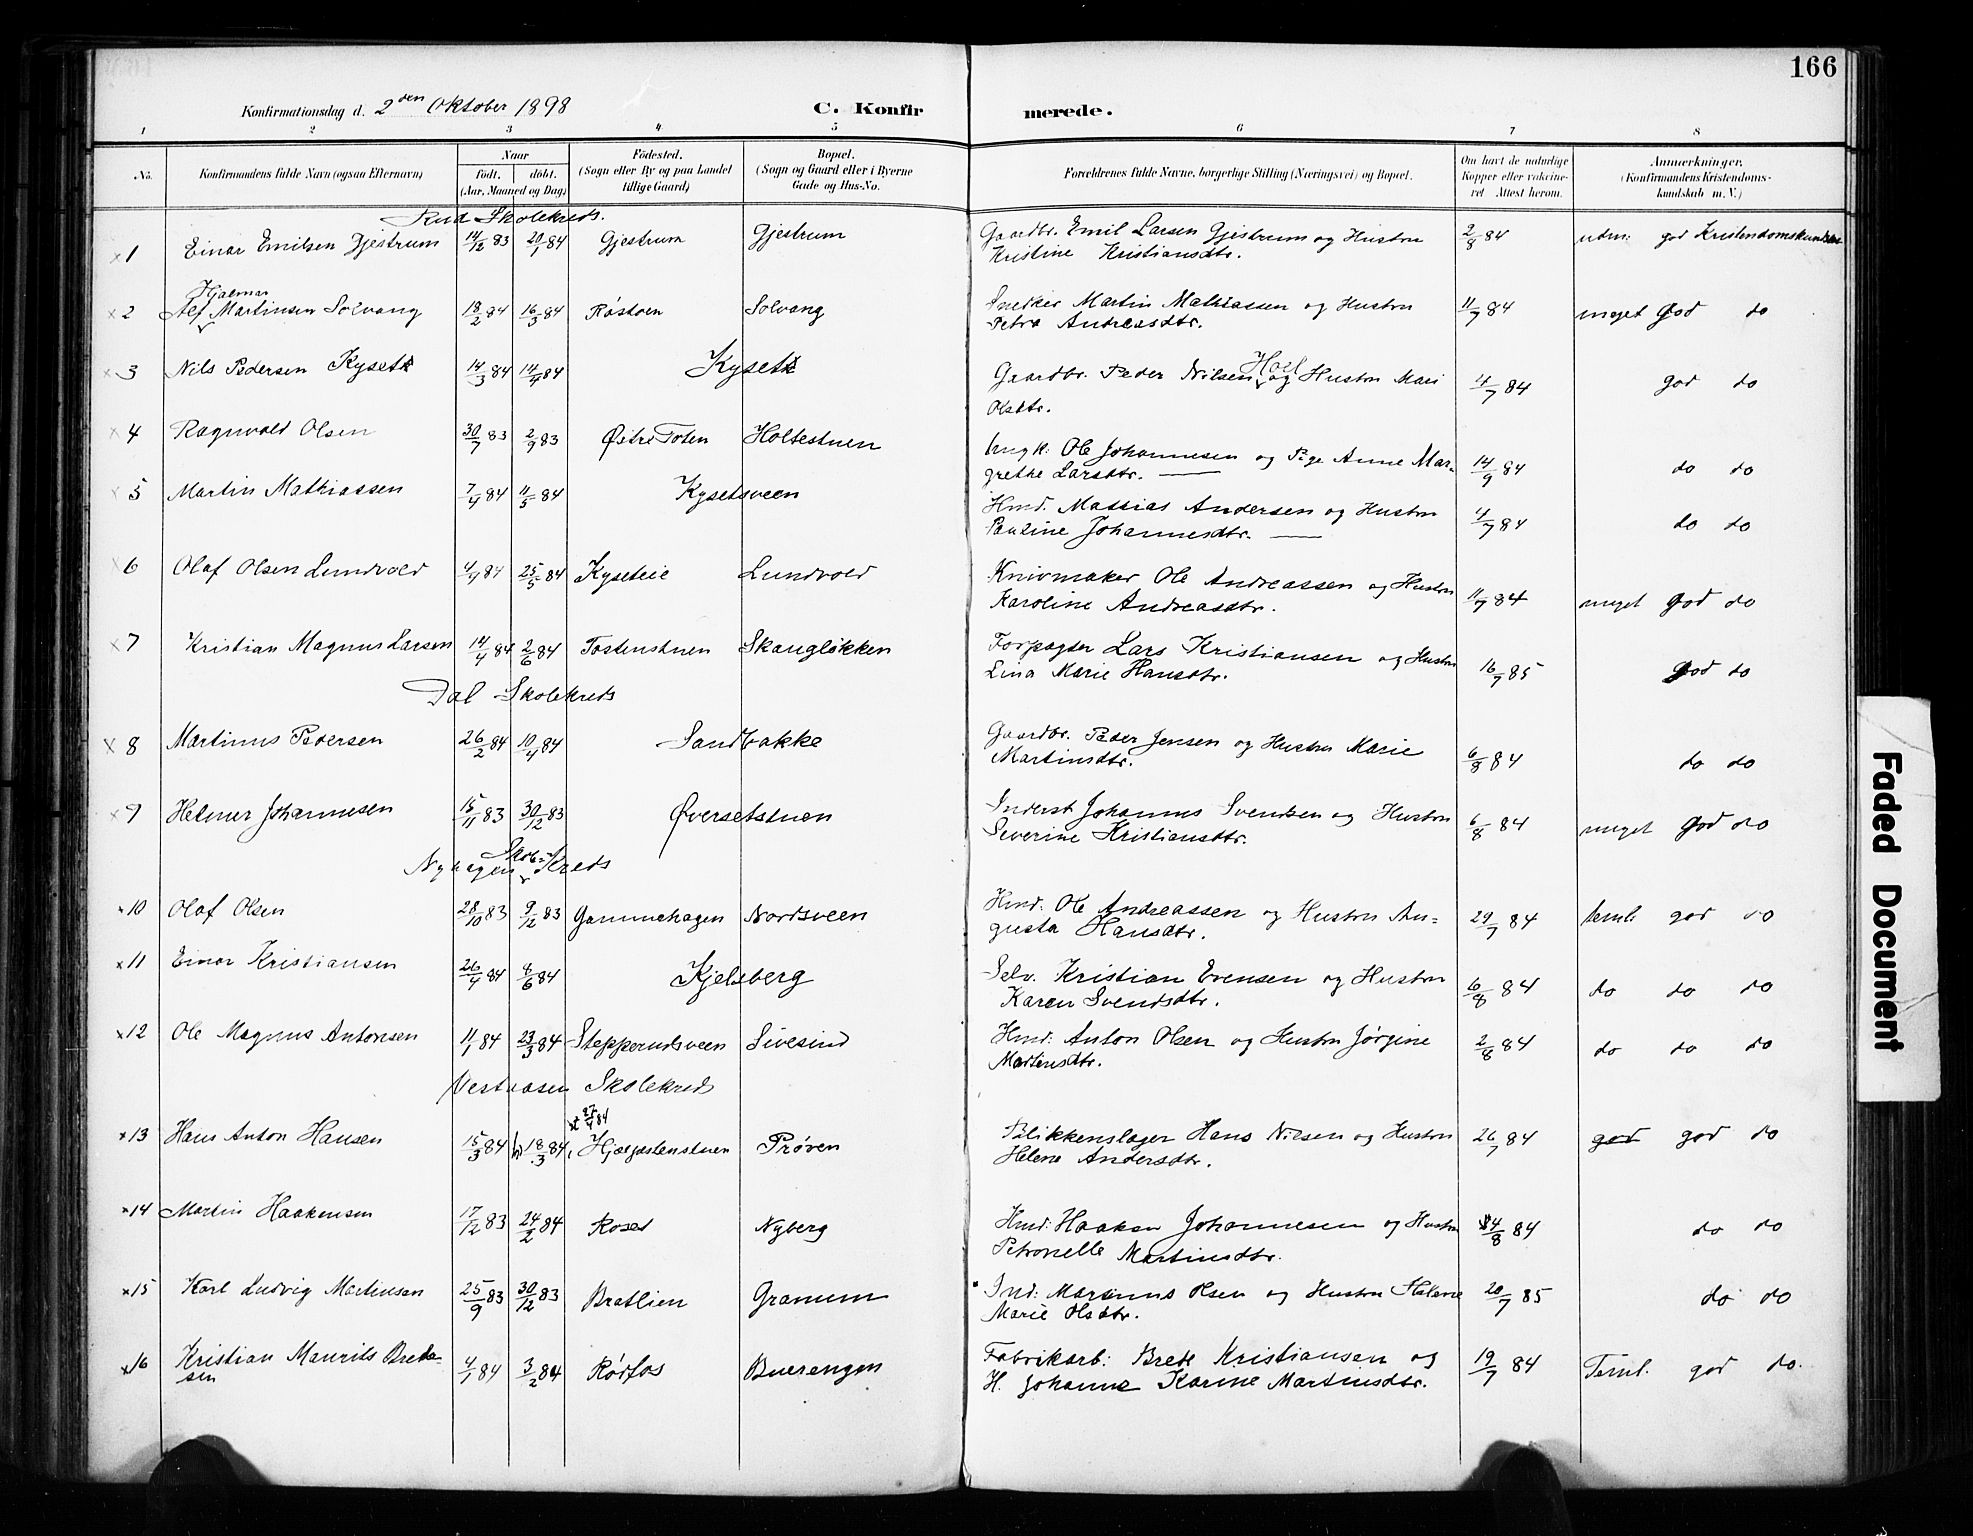 SAH, Vestre Toten prestekontor, H/Ha/Haa/L0011: Ministerialbok nr. 11, 1895-1906, s. 166